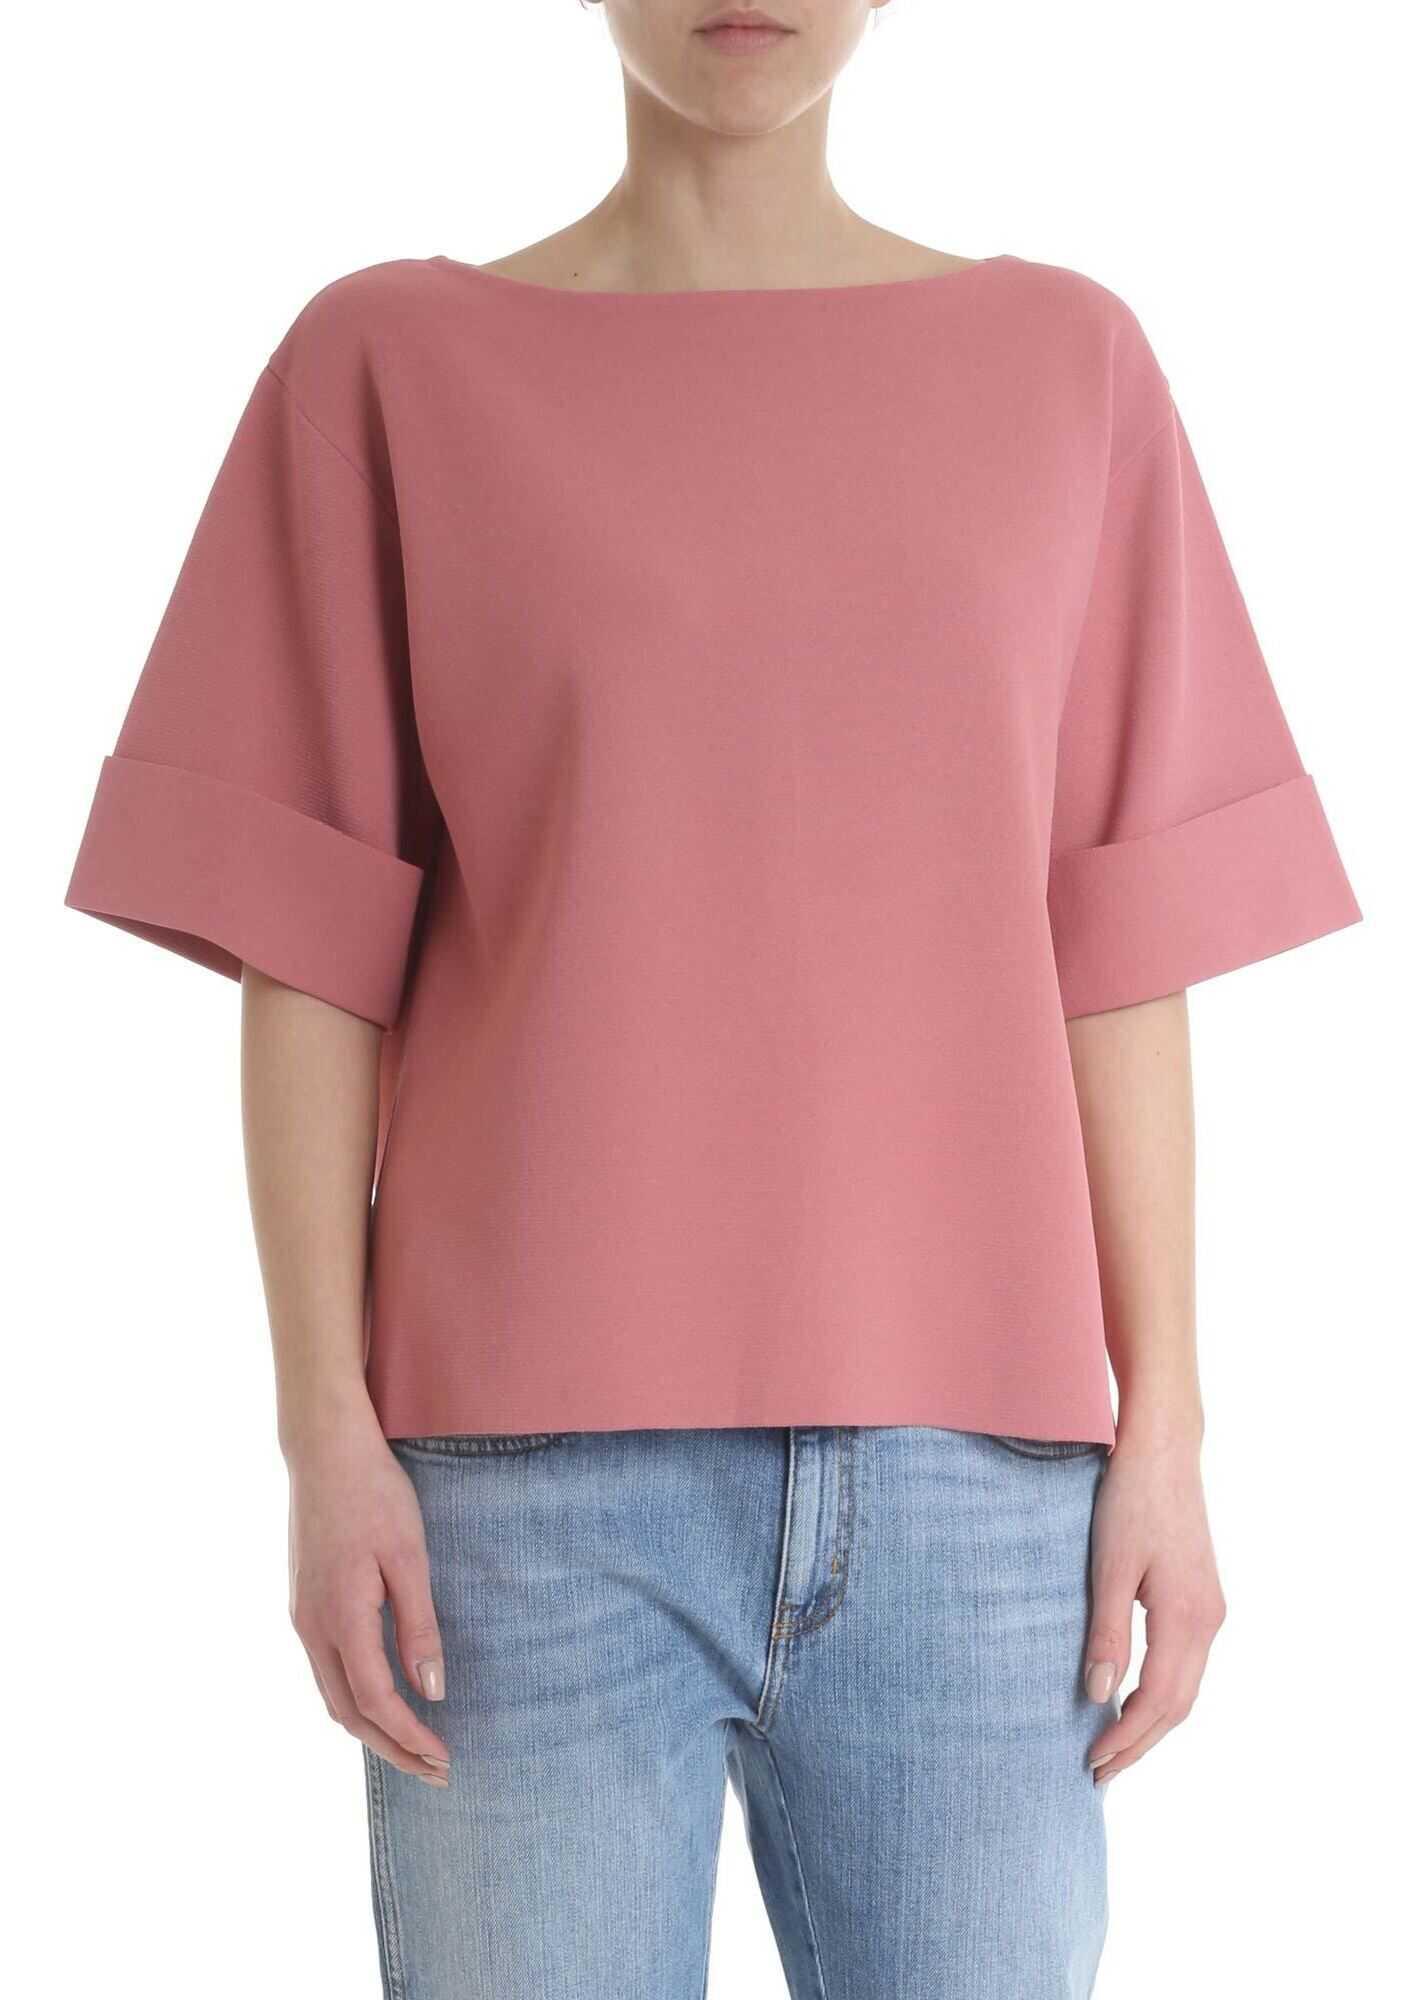 adidas by Stella McCartney Antique Pink Stella Mccartney T-Shirt Pink